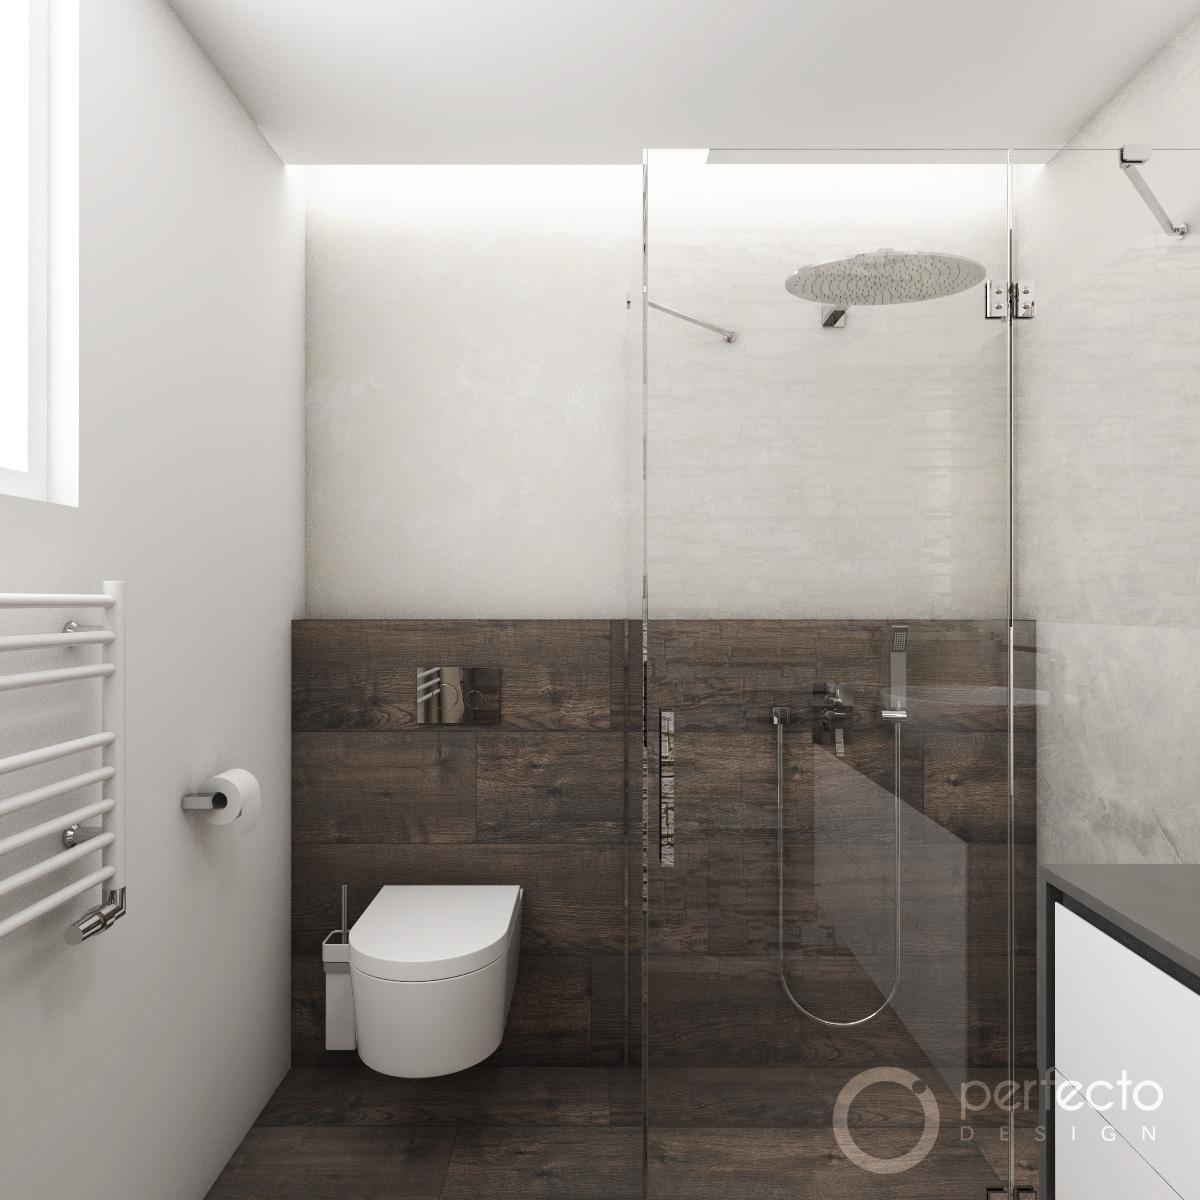 Badezimmer 6 M2 natur badezimmer perfecto design